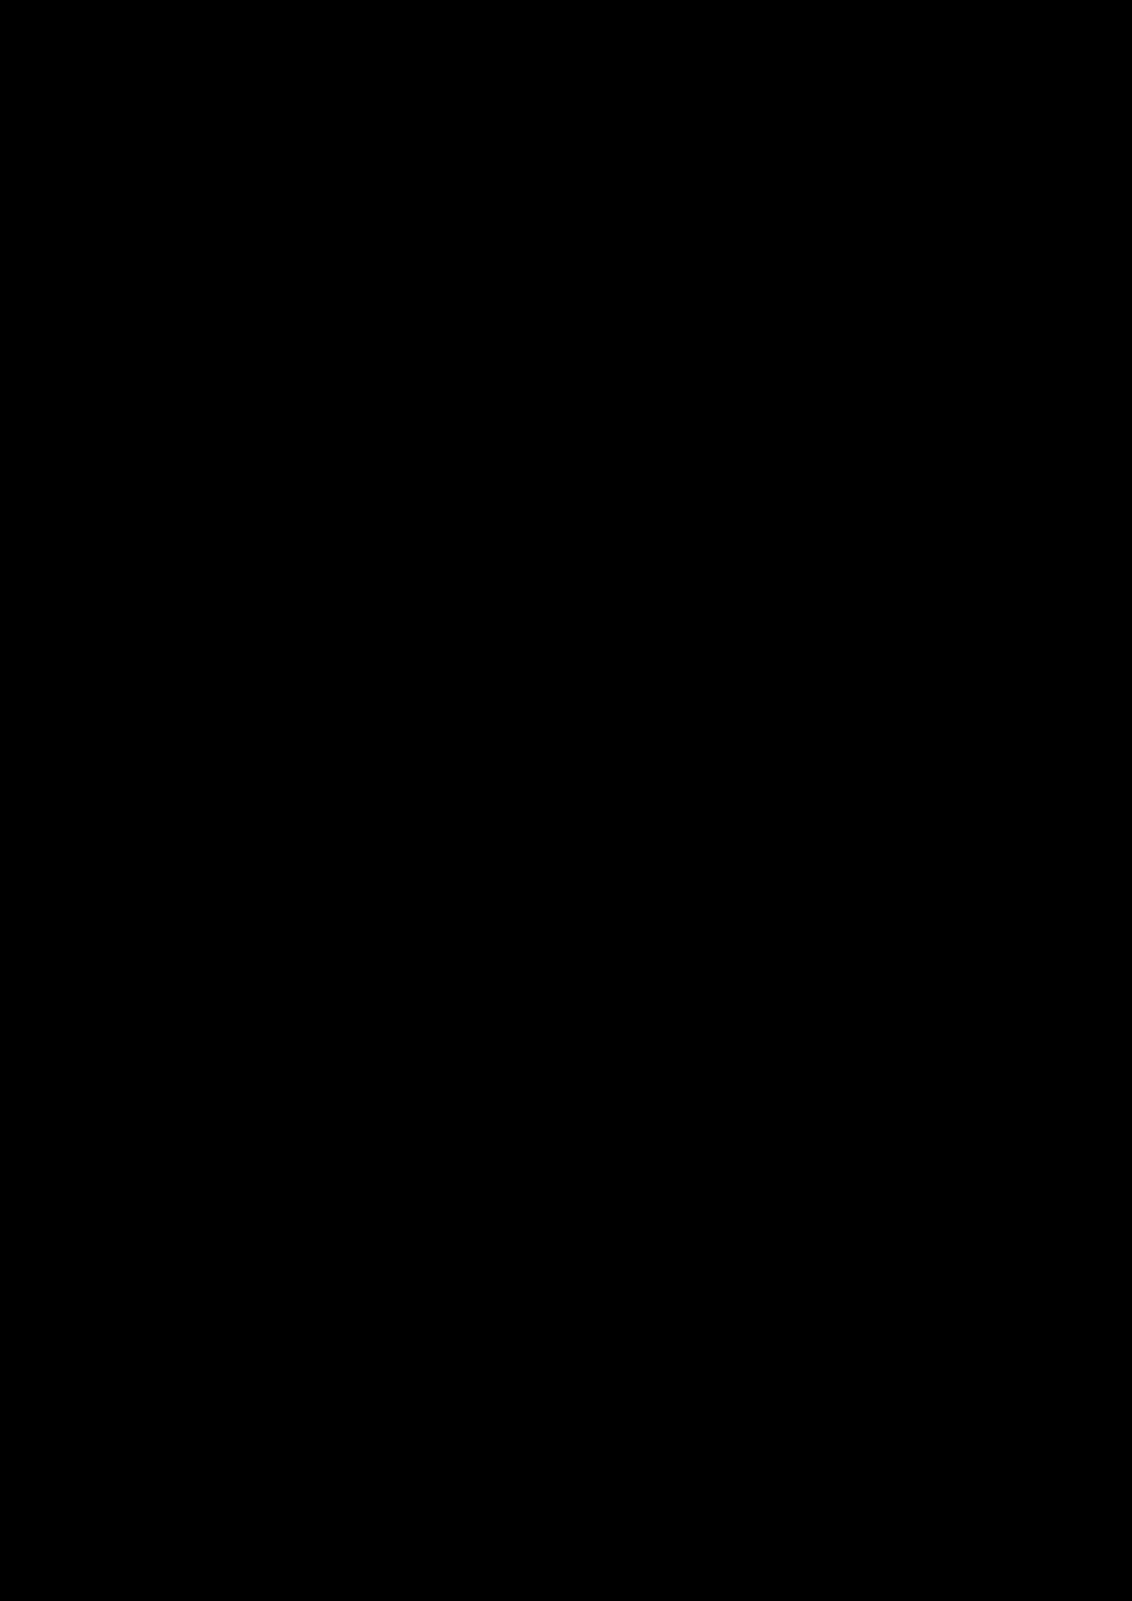 Belyiy sokol slide, Image 124